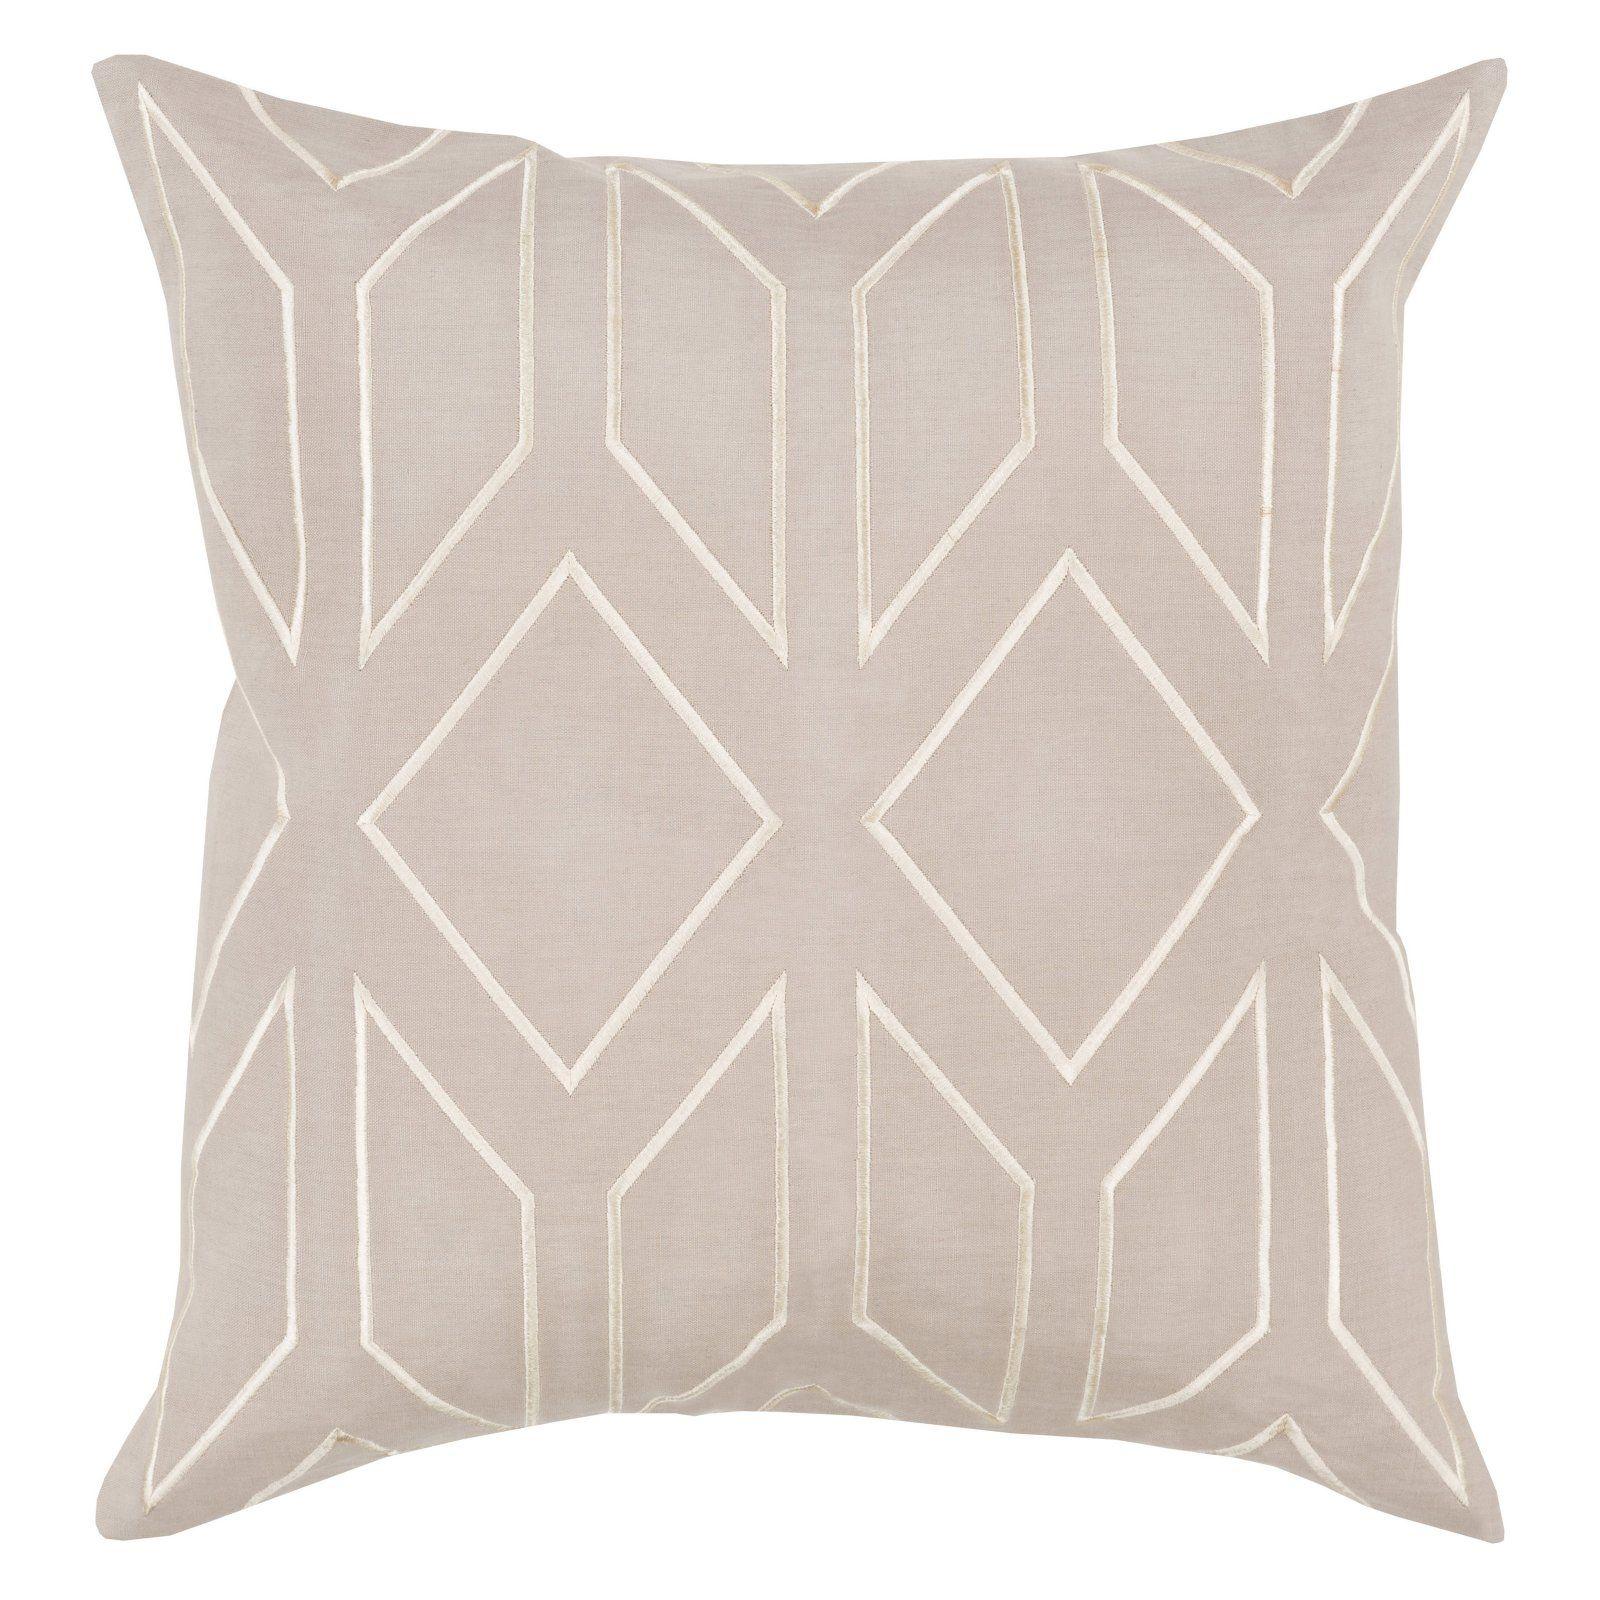 Surya Skyline Iv Decorative Throw Pillow Down Neutral Throw